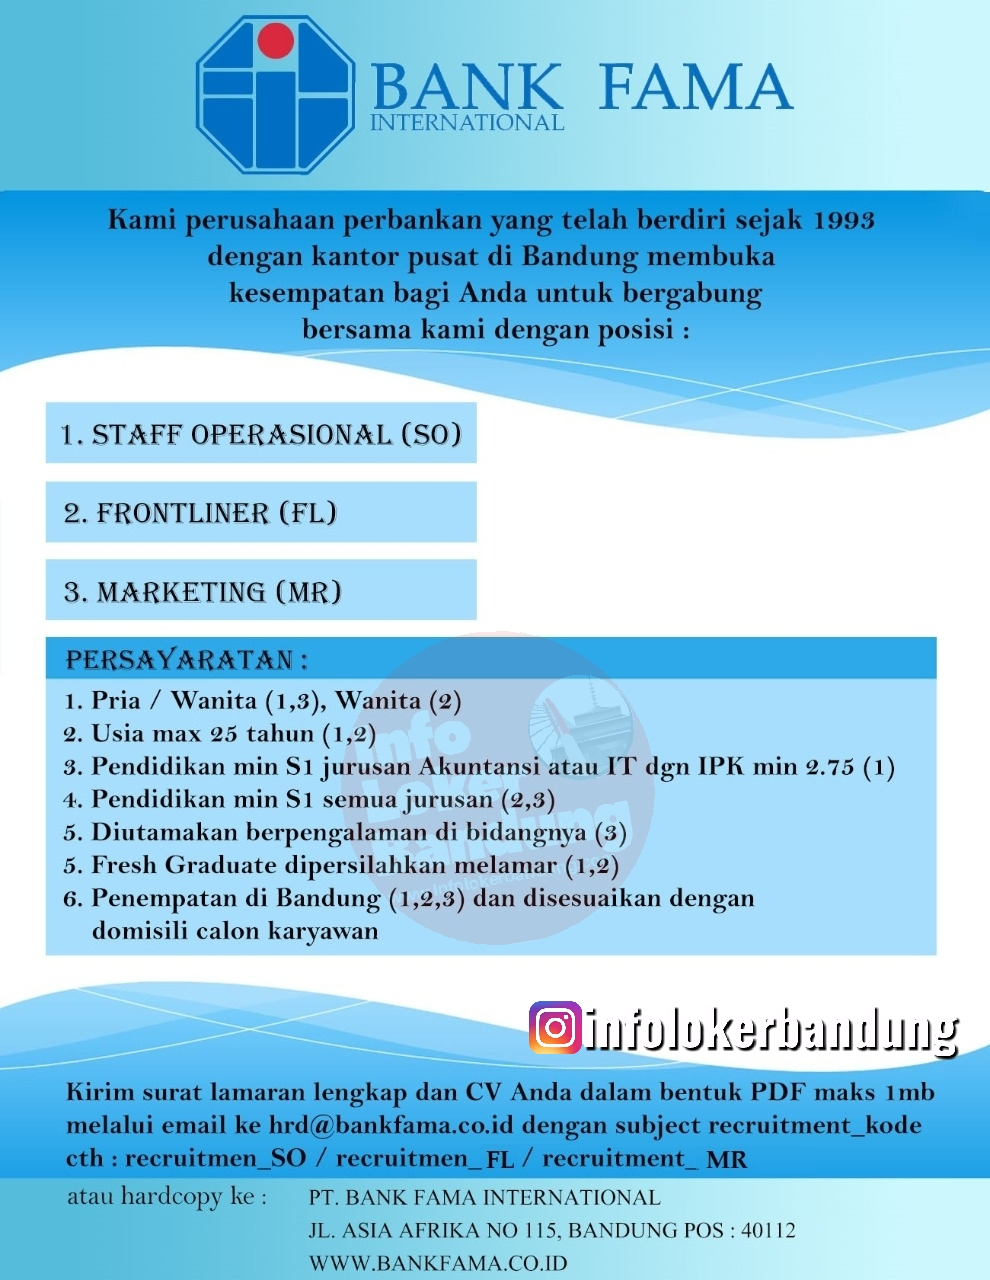 Lowongan Kerja PT. Bank Fama International Bandung Januari 2020